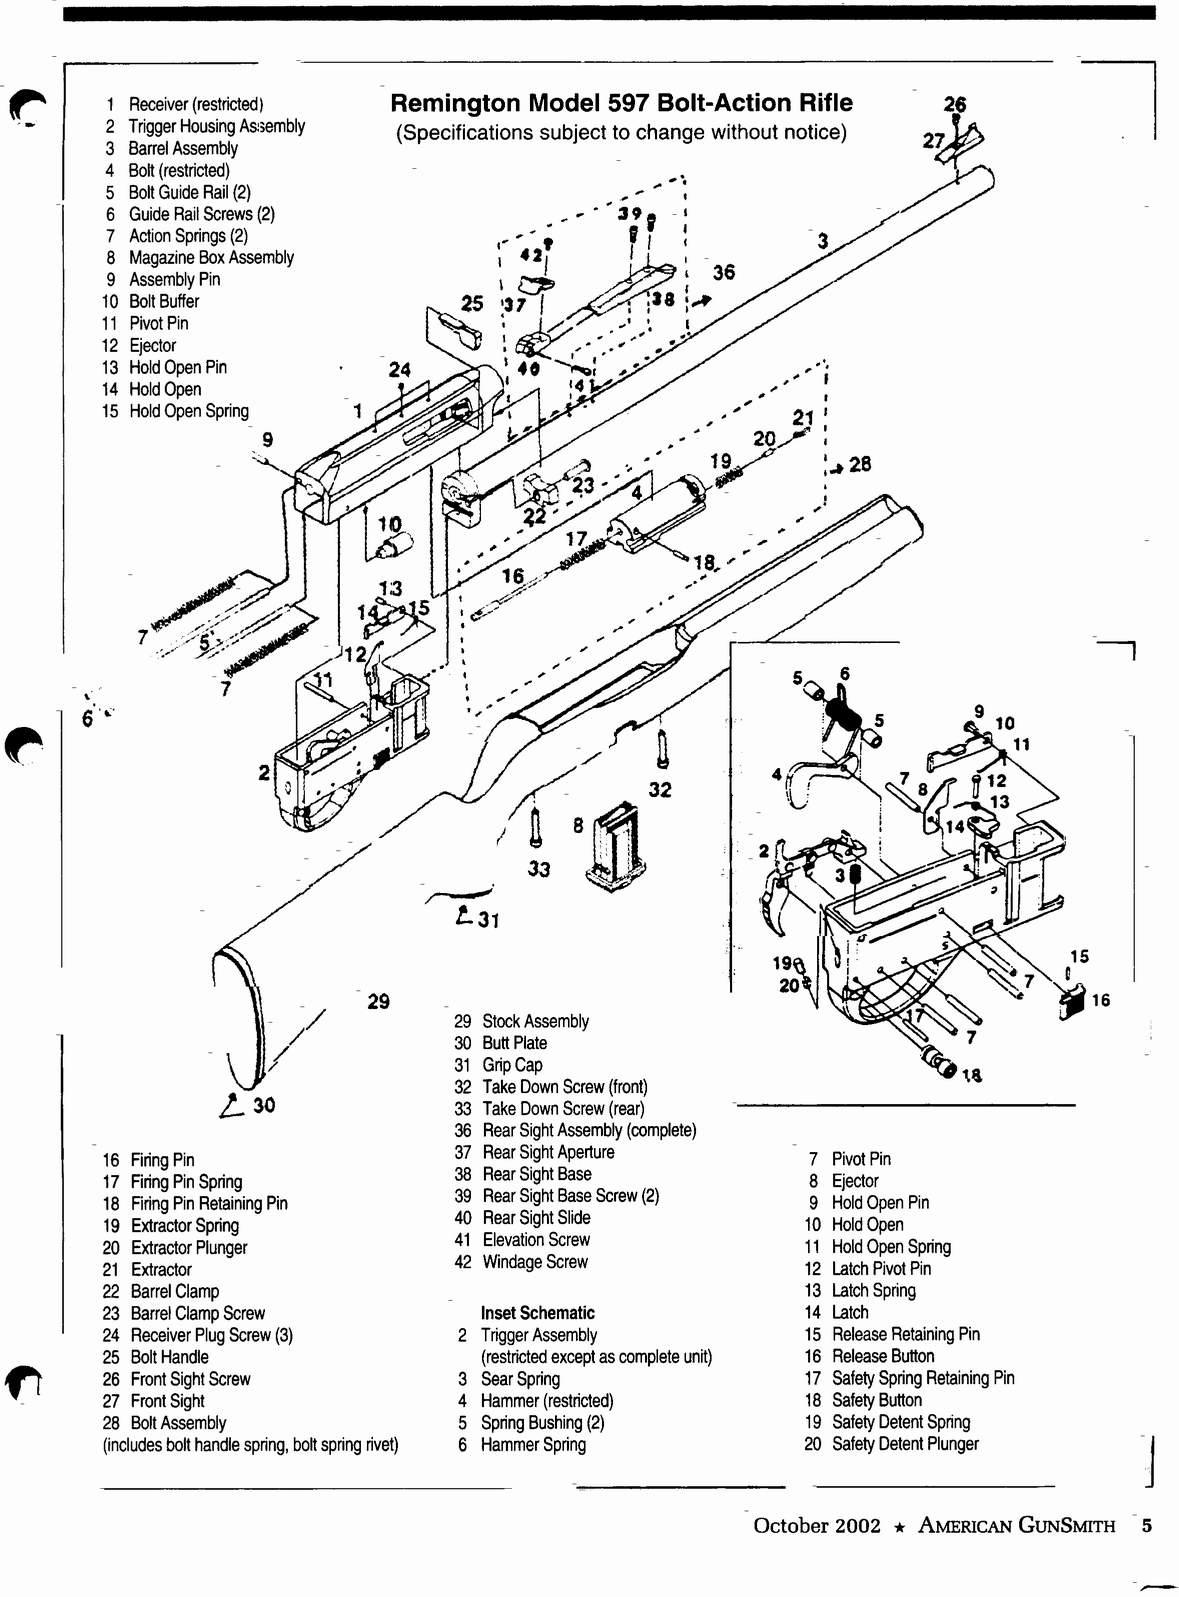 diagram for remington 597 bolt assembly receiver, bolt & barrel parts images - frompo #4